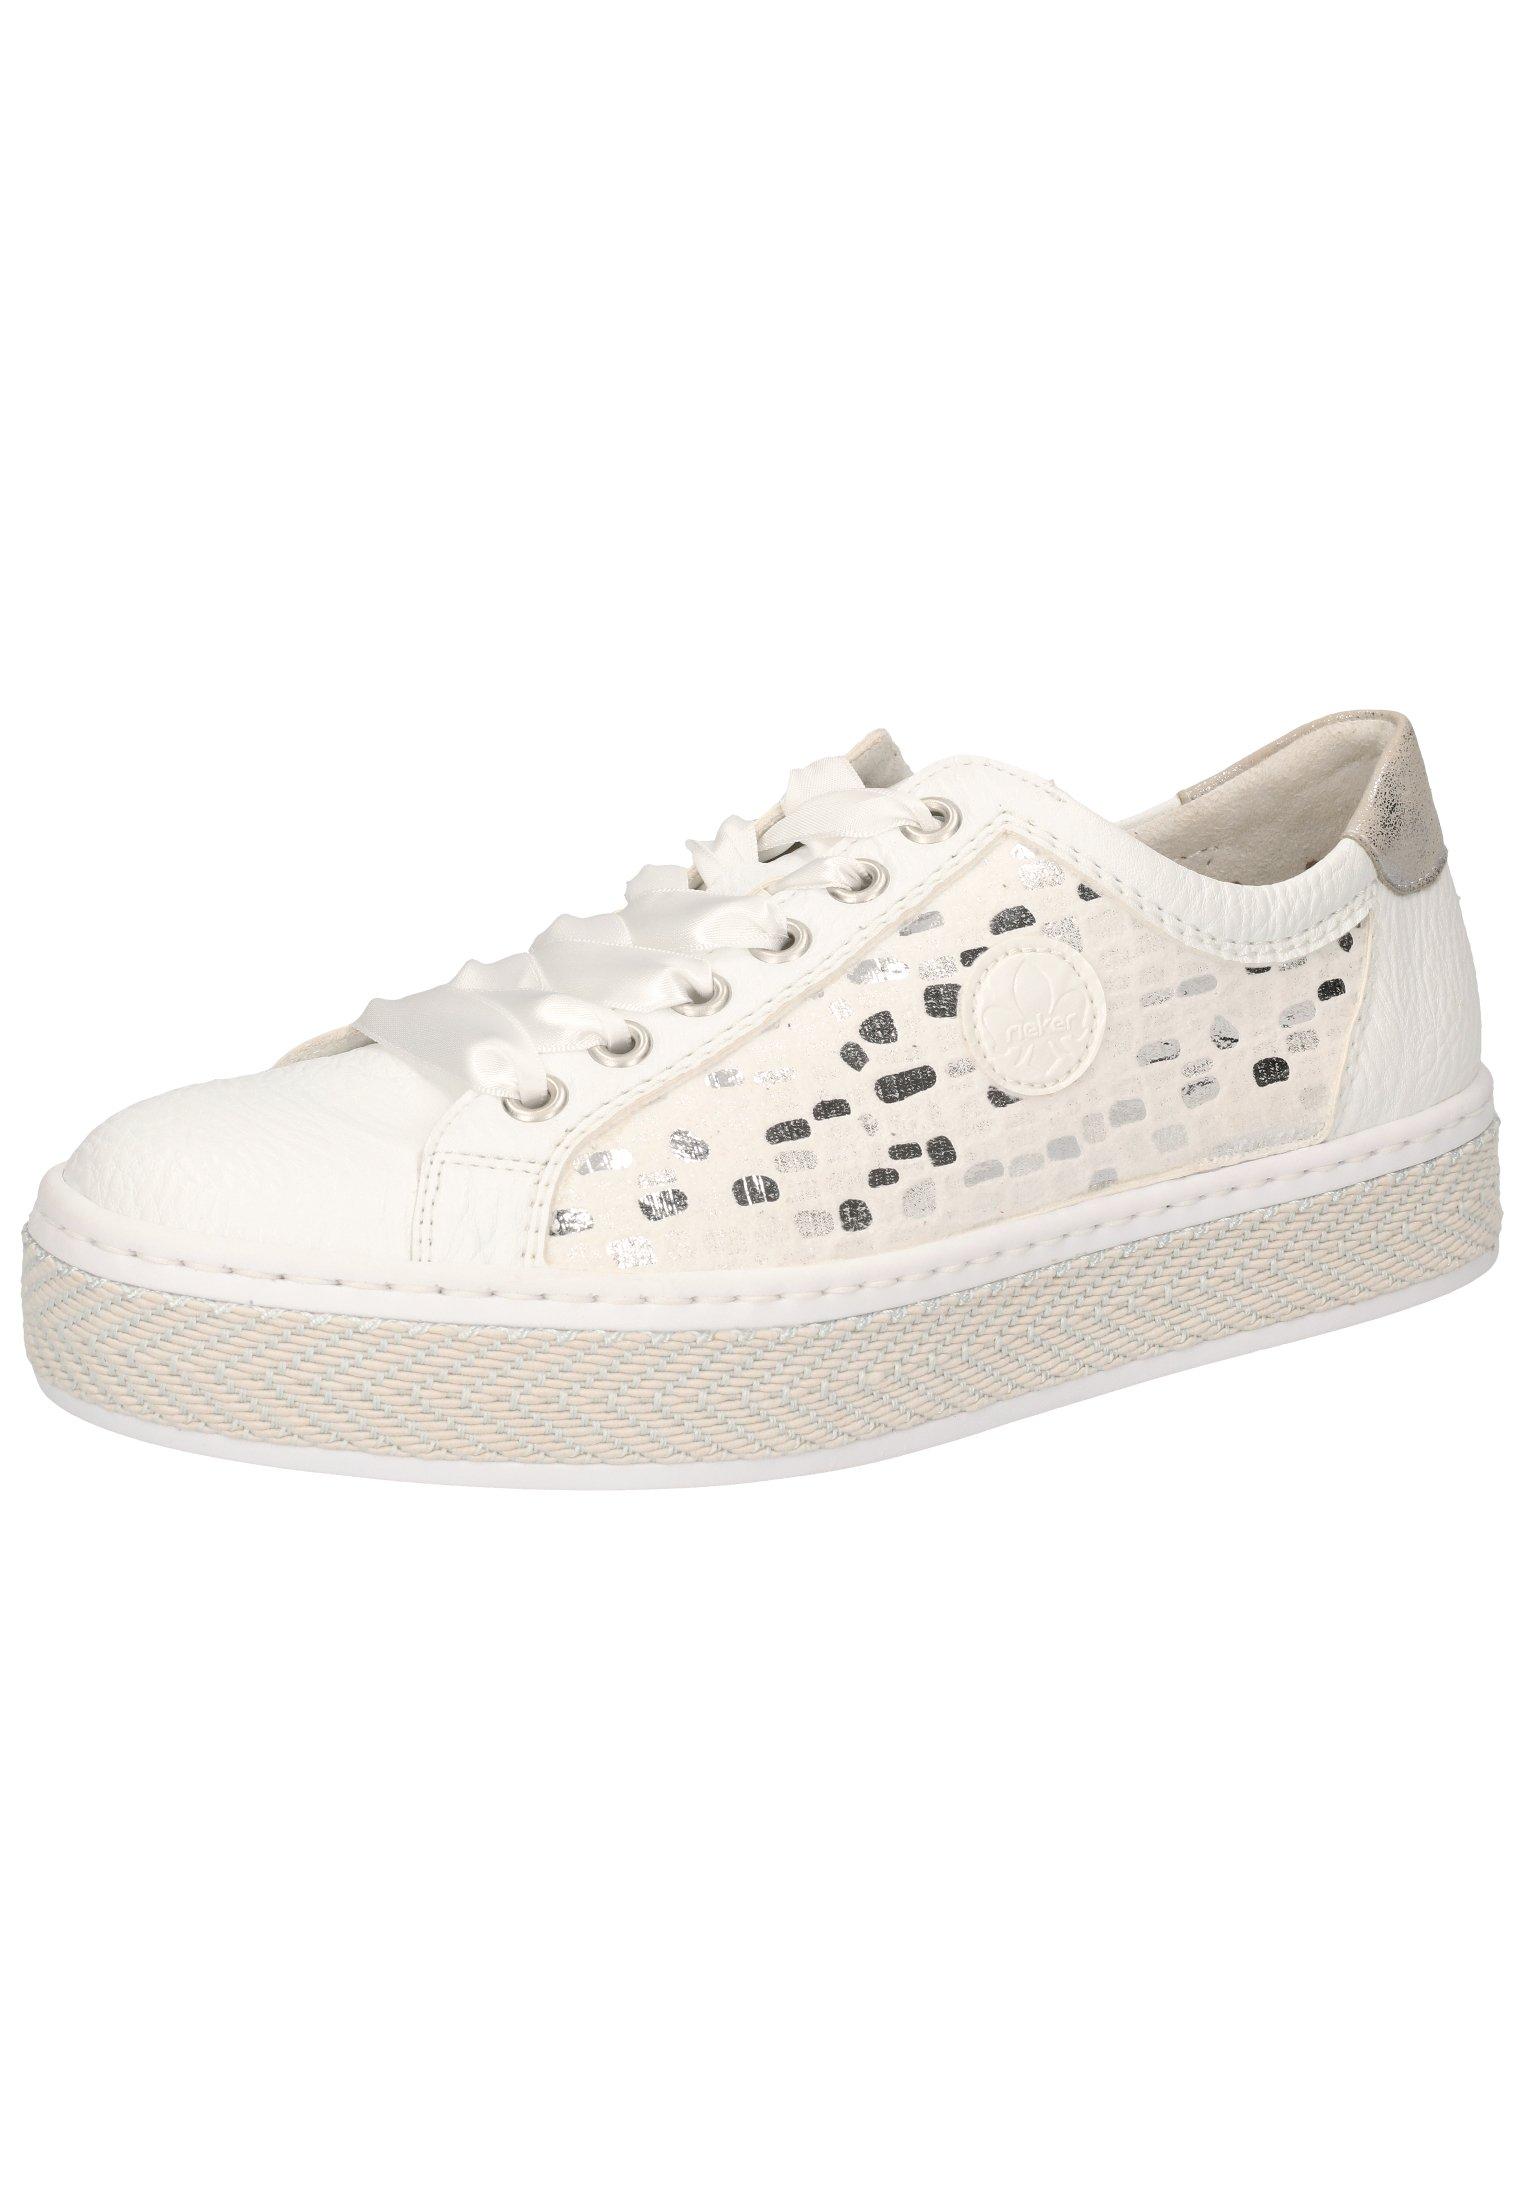 Rieker 38 silbergrau Sneaker 69,90€ | eBay